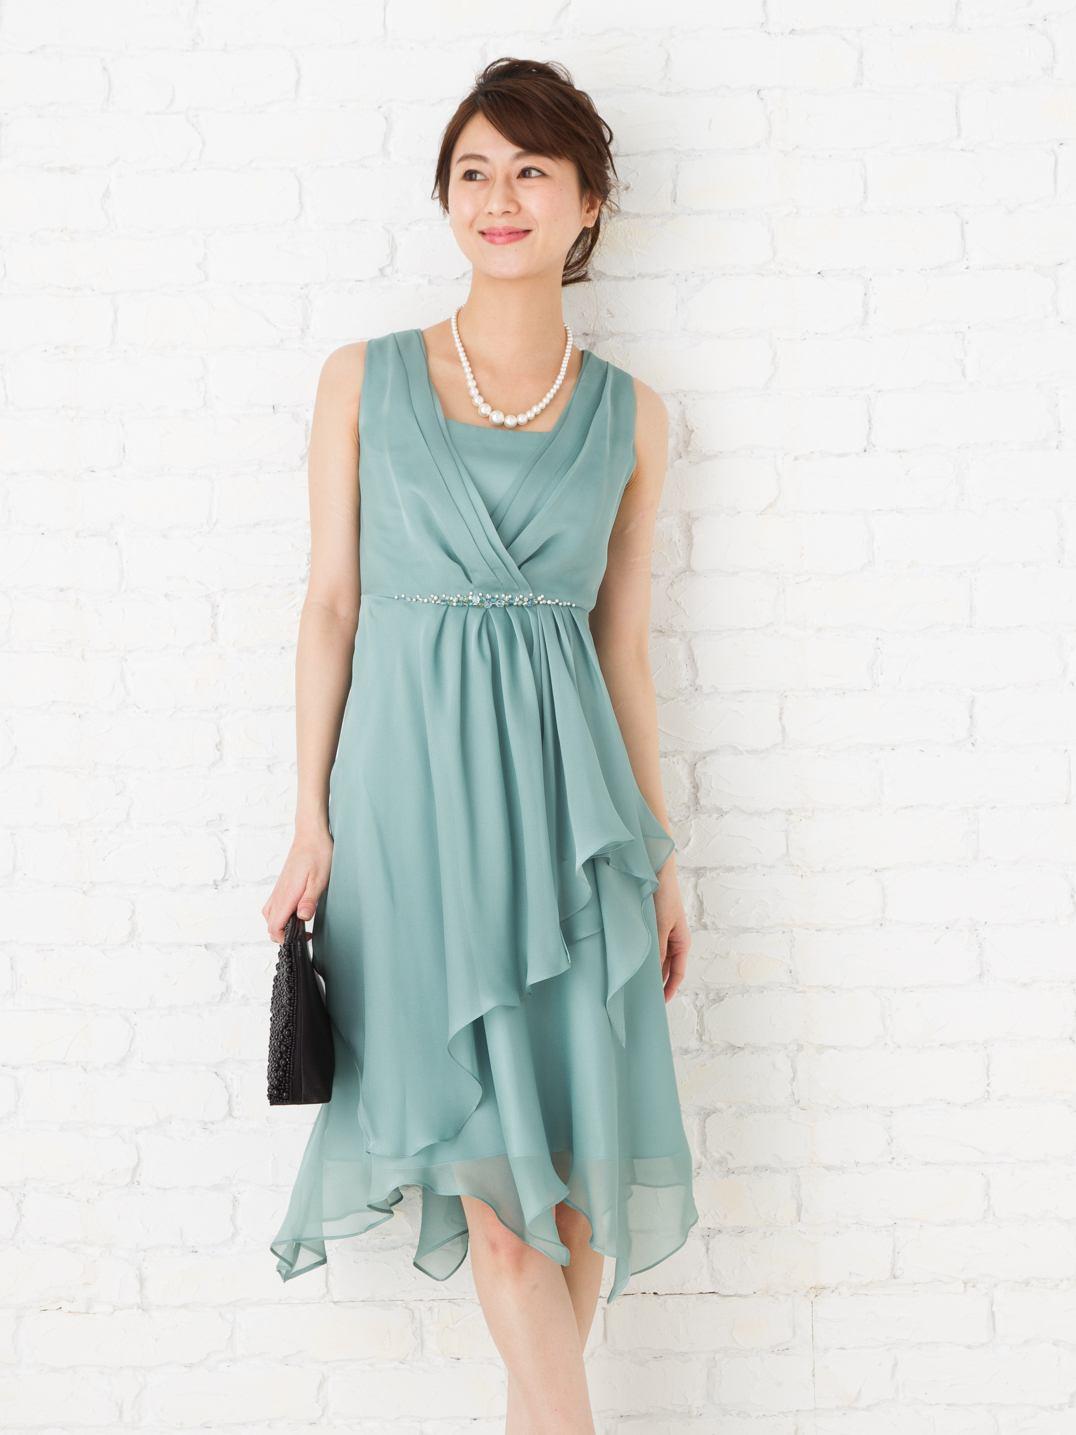 PREFERENCE PARTY'S ドレス / Mサイズ (DOC0021)